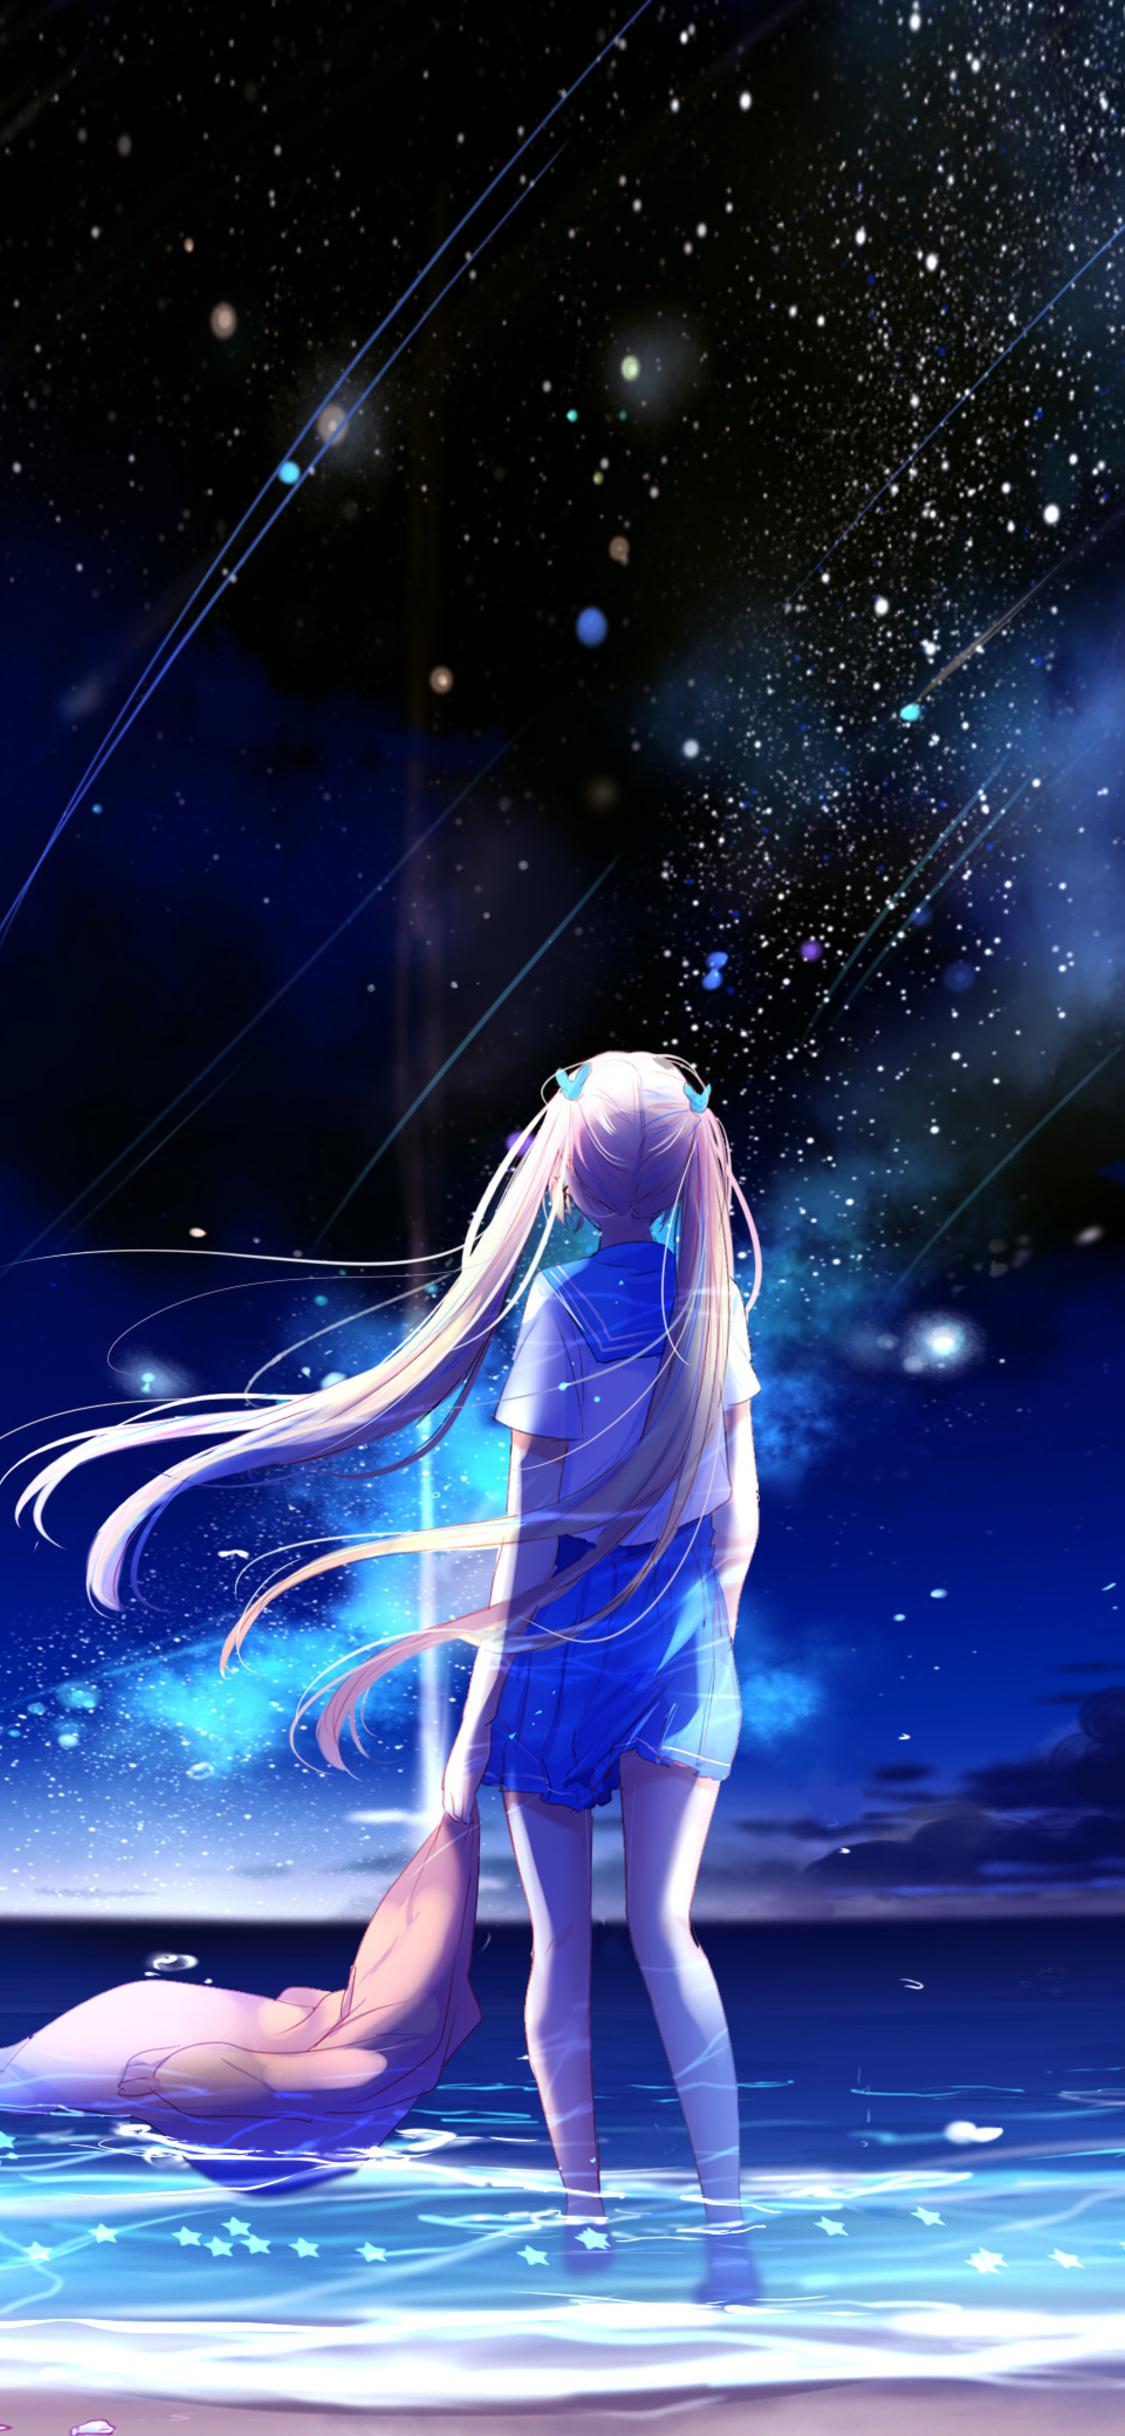 1125x2436 Animegirl Night Sea Stars Fantasy Iphone Xs Iphone 10